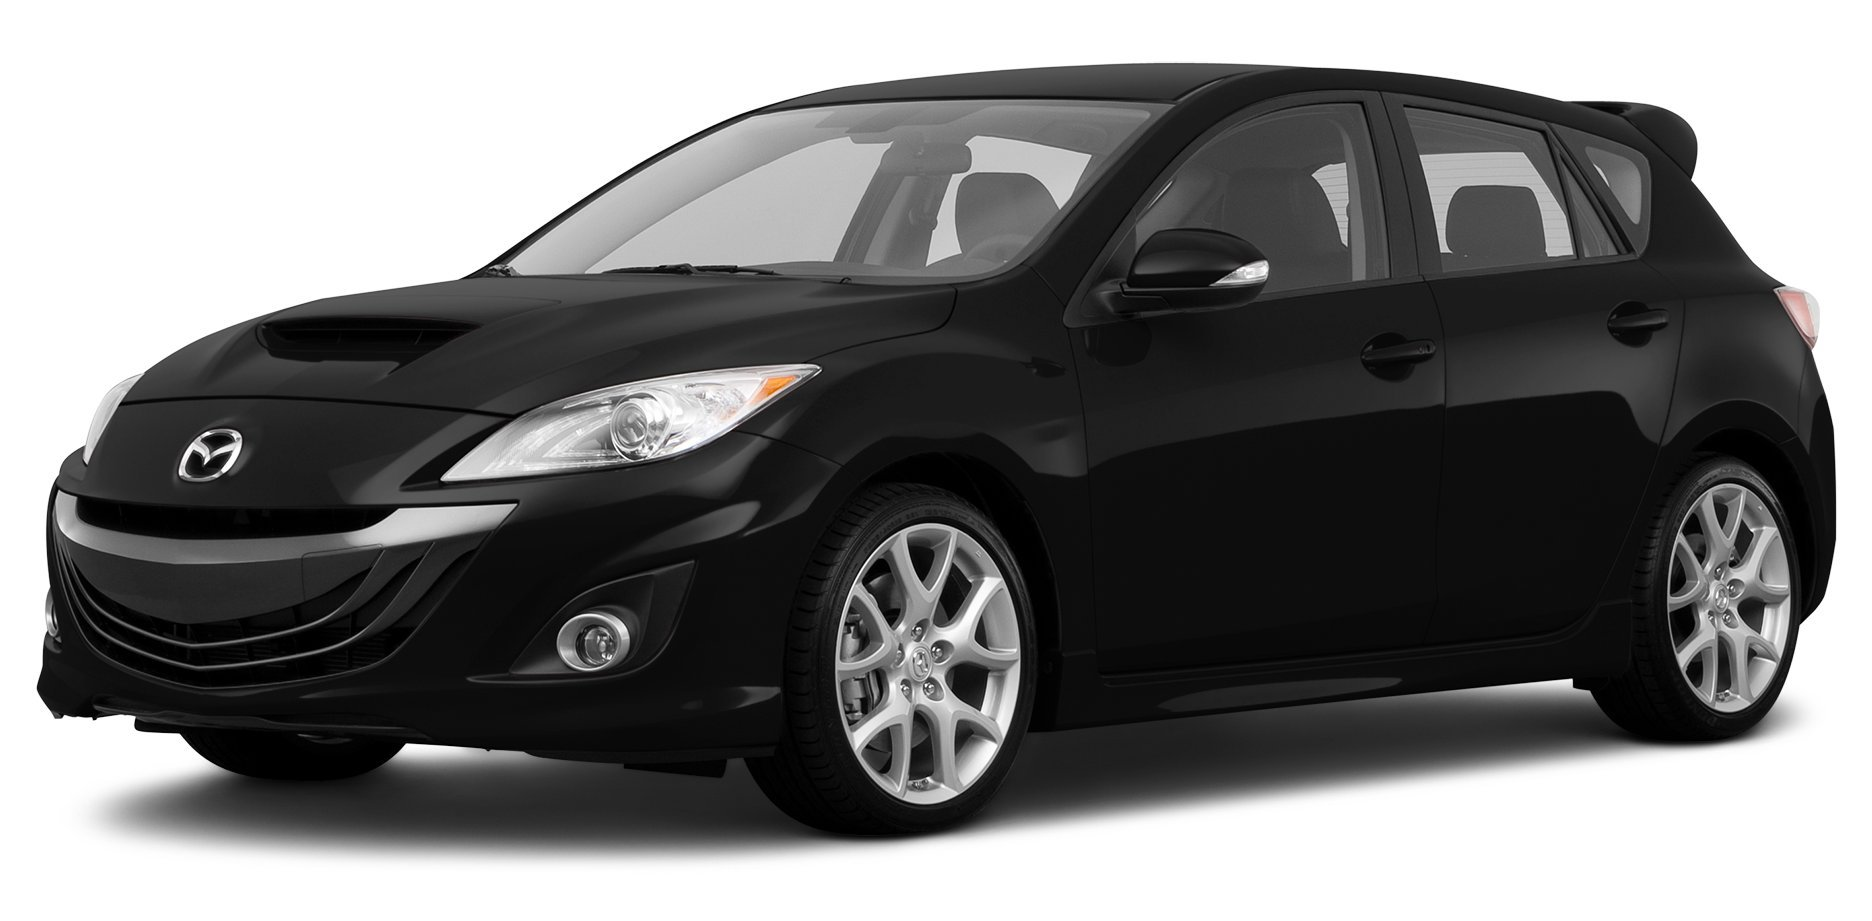 Mazda 3 Service Manual: Precaution ABS